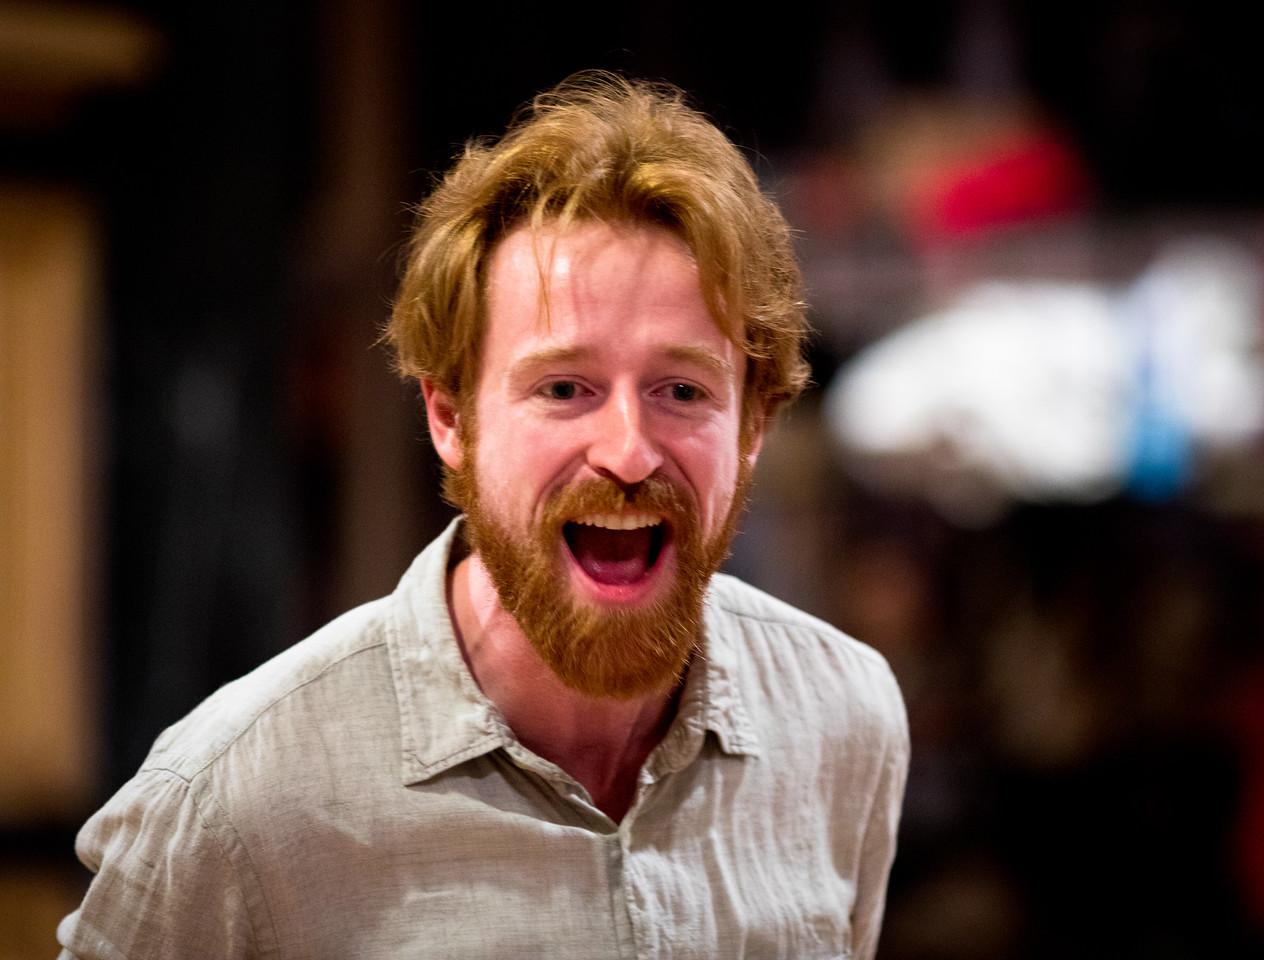 Calder Shilling (Macbeth) in rehearsal for MACBETH. Photo by Jay McClure.